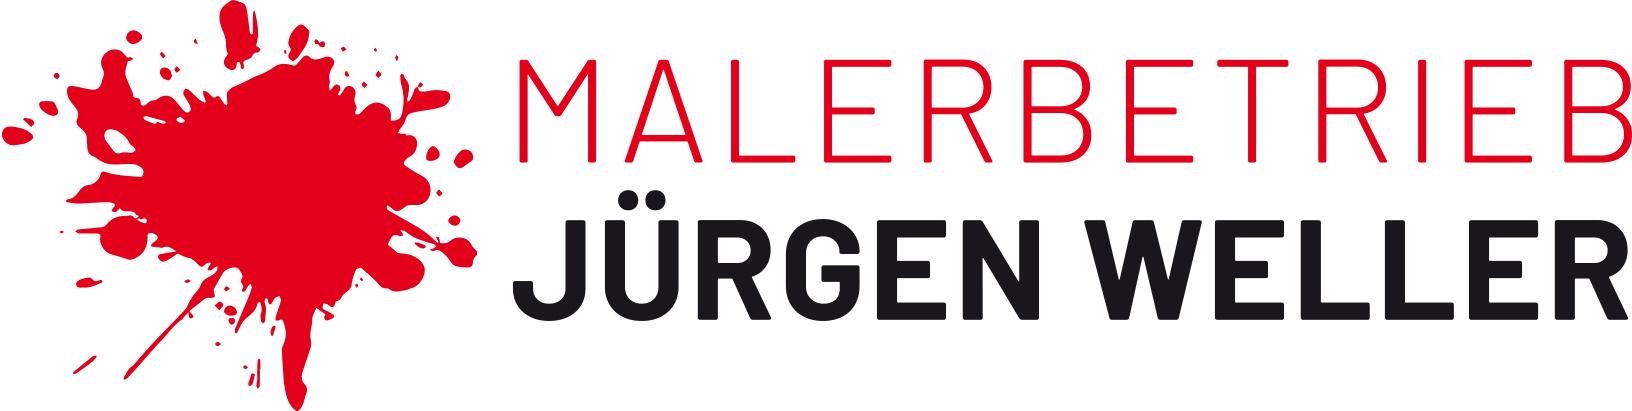 Malerbetrieb Jürgen Weller - Logo